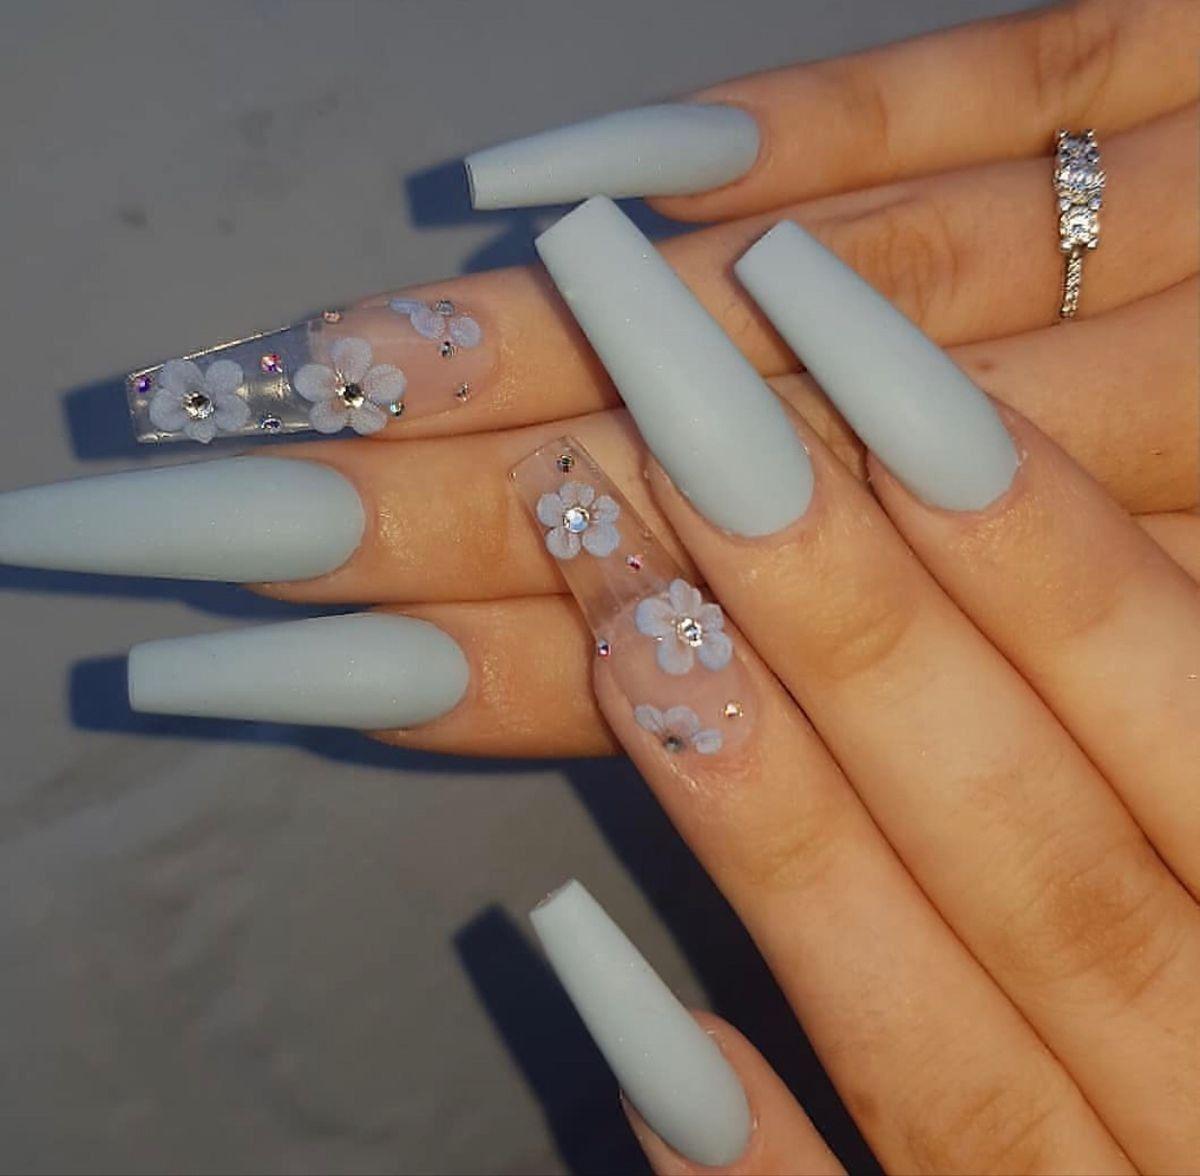 Pin By Glory On M A K E U P And N A I L S In 2020 Glamour Nails Blue Acrylic Nails Glitter Nails Acrylic